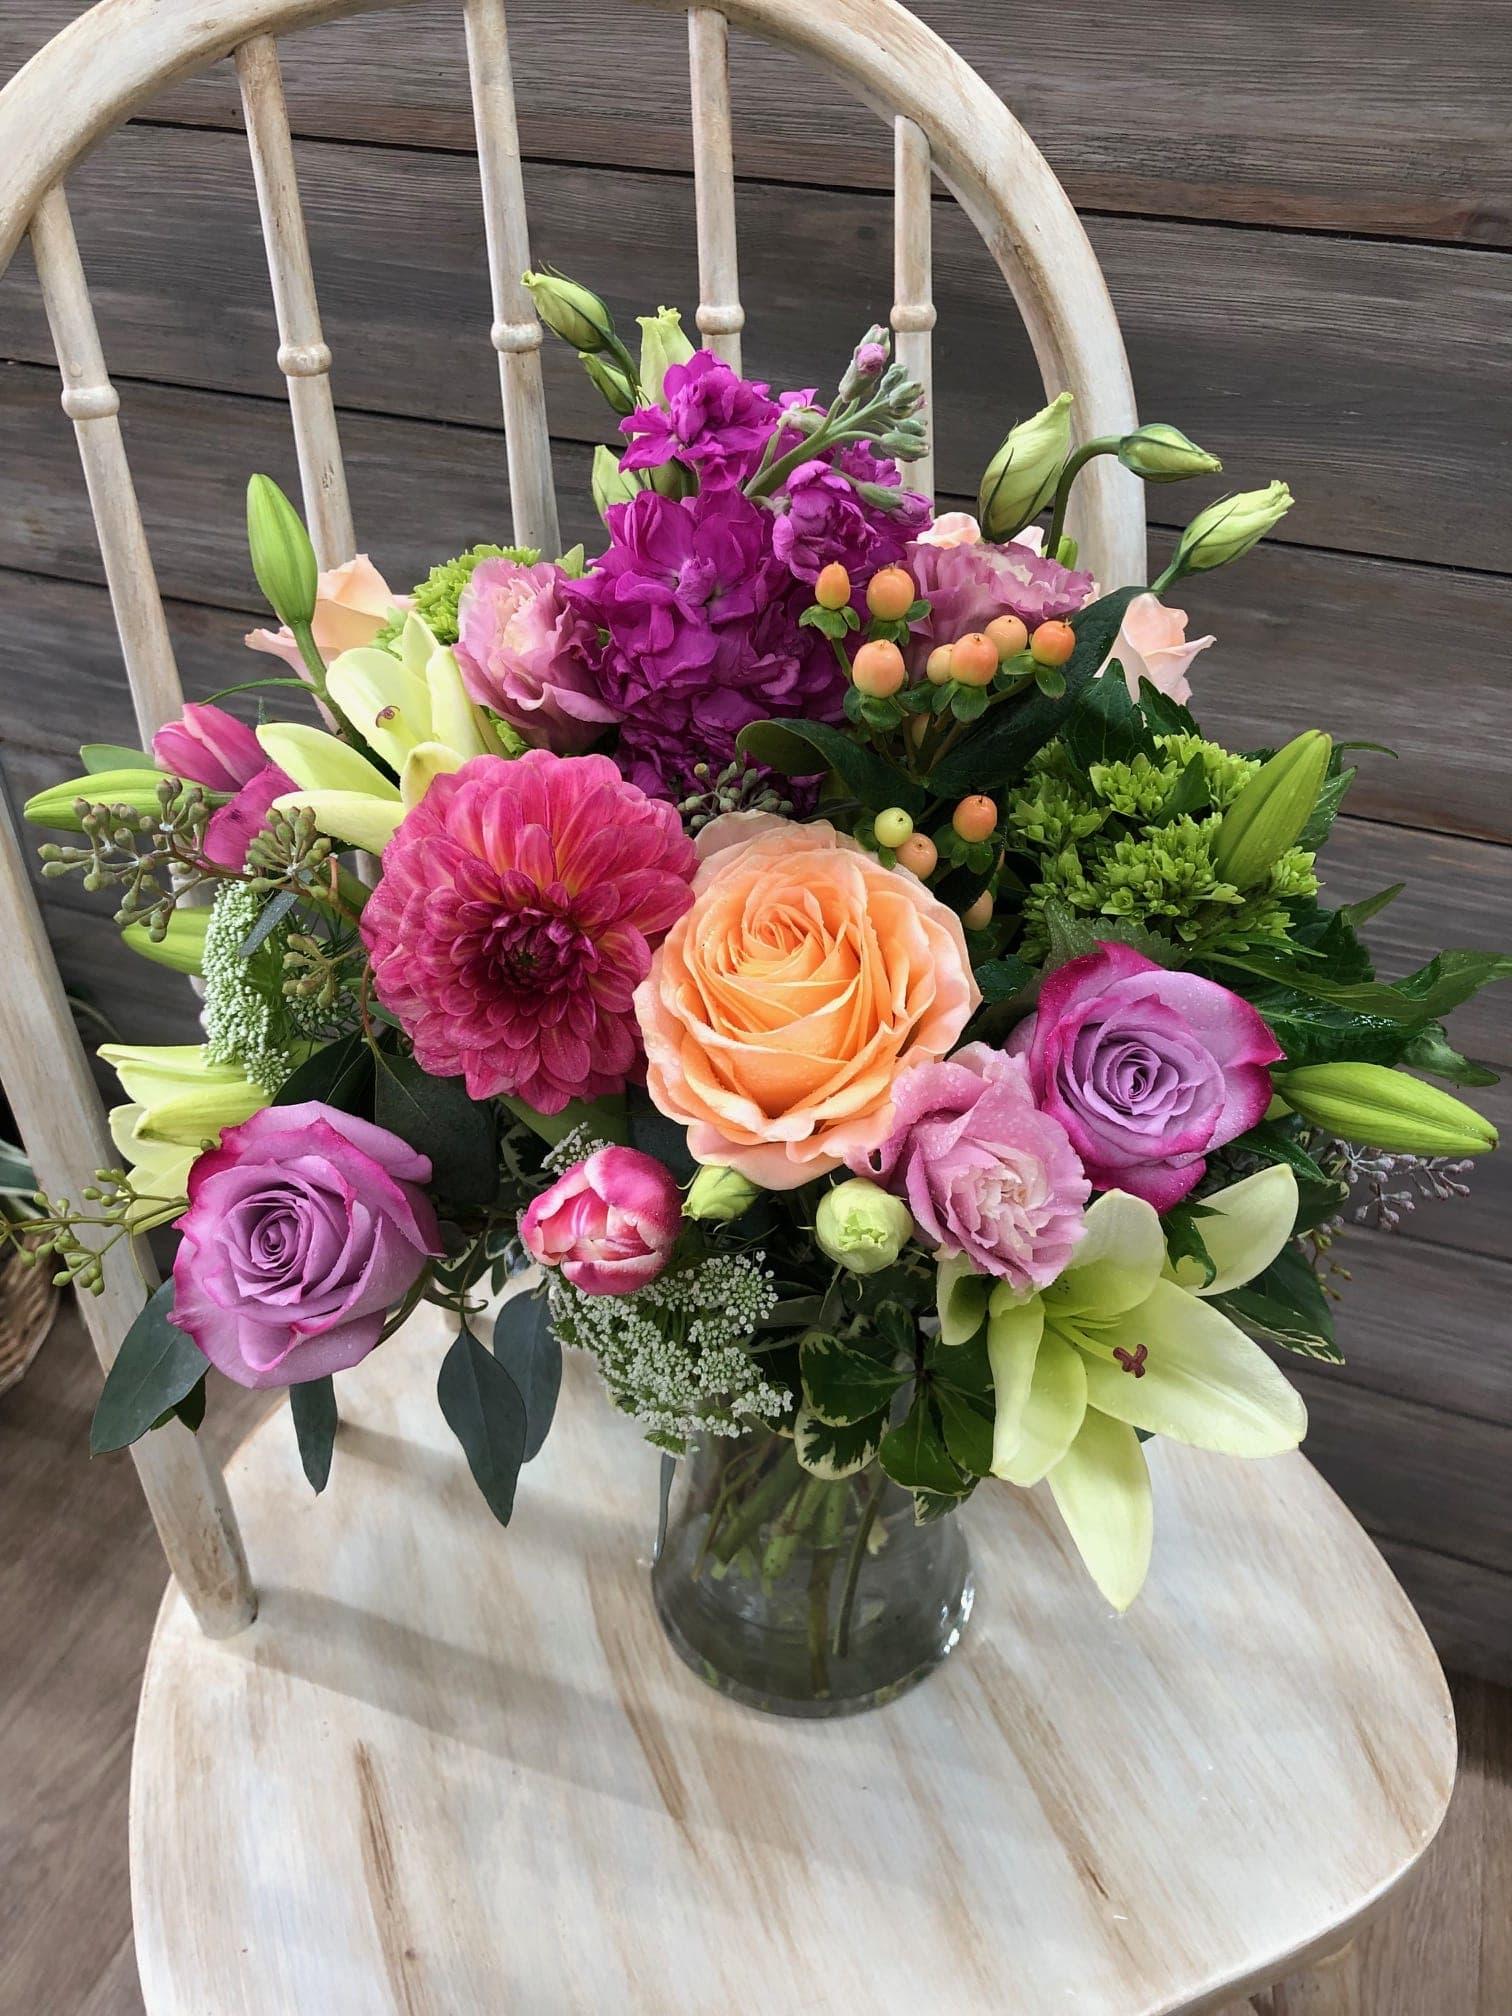 Garden Of Beauty Bouquet in Smyrna, GA | Floral Creations Florist